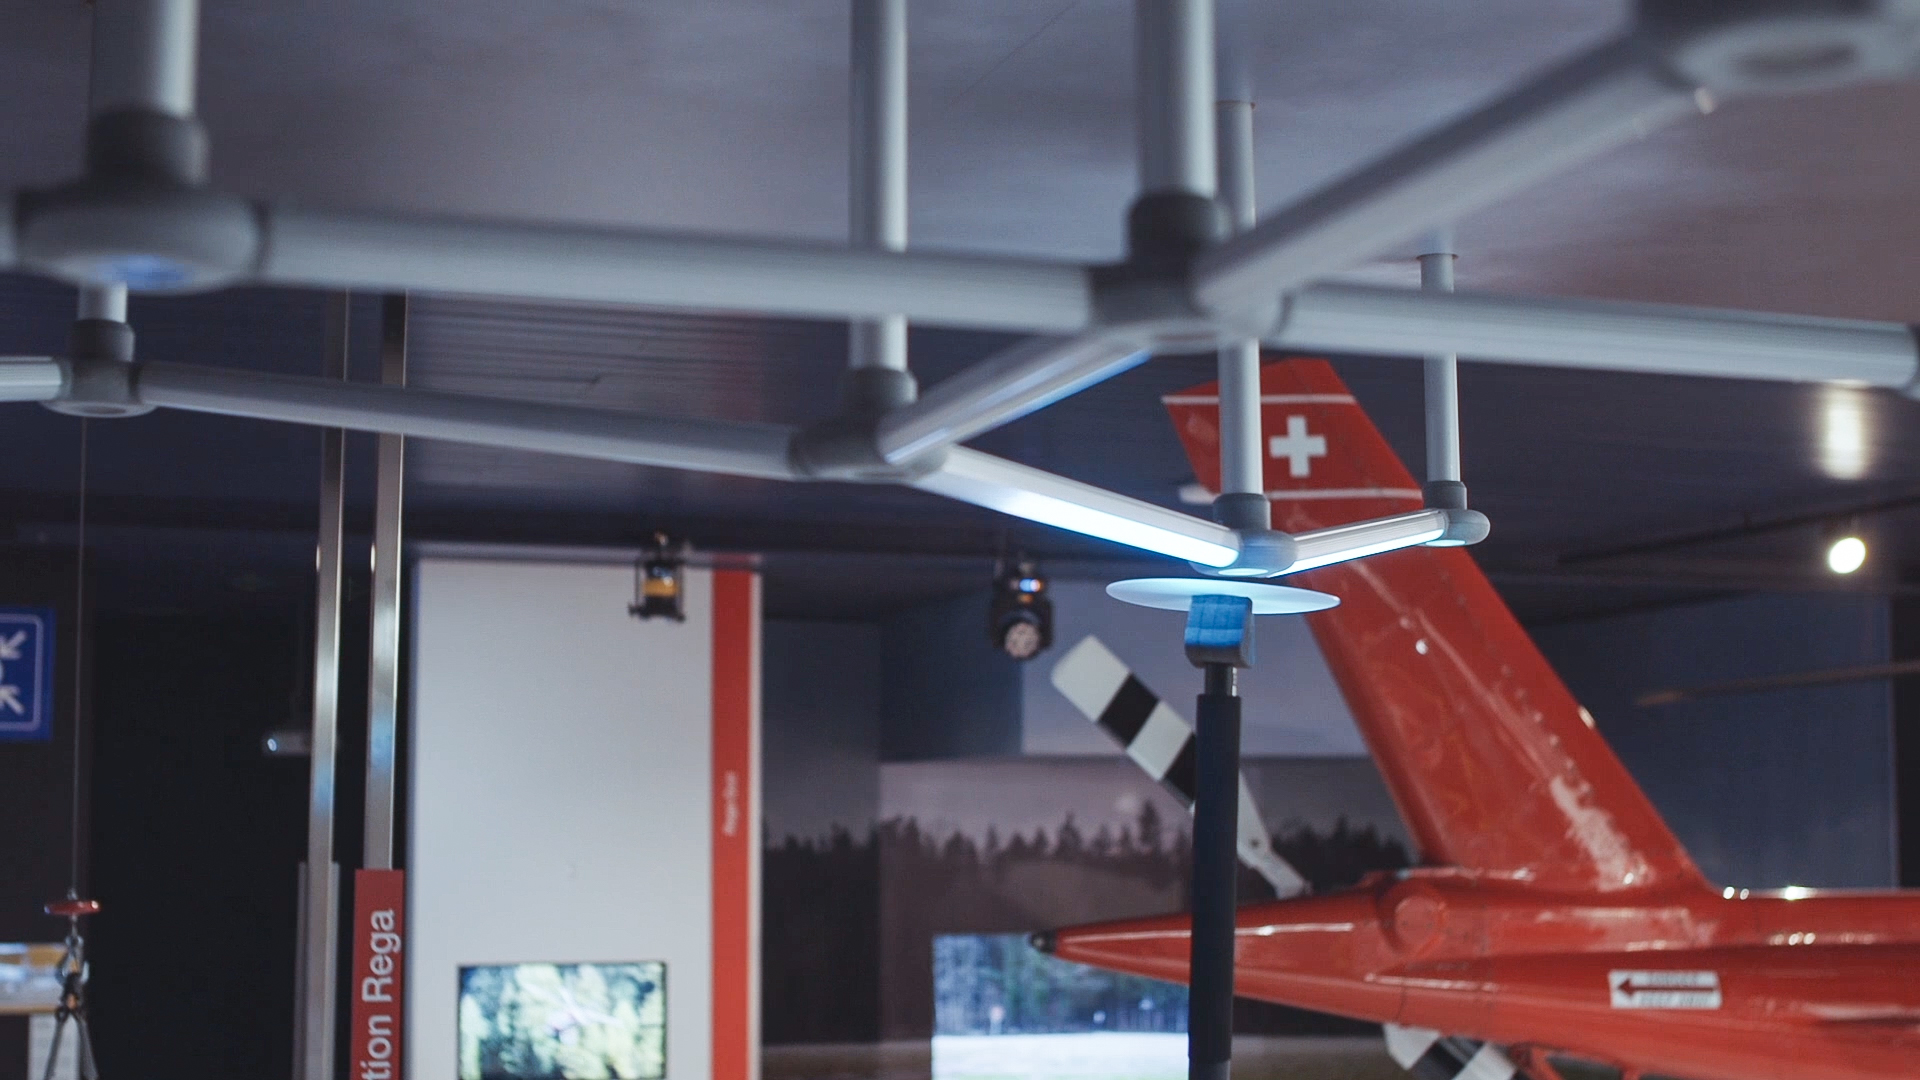 Interaktives Hubschrauber-Exponat